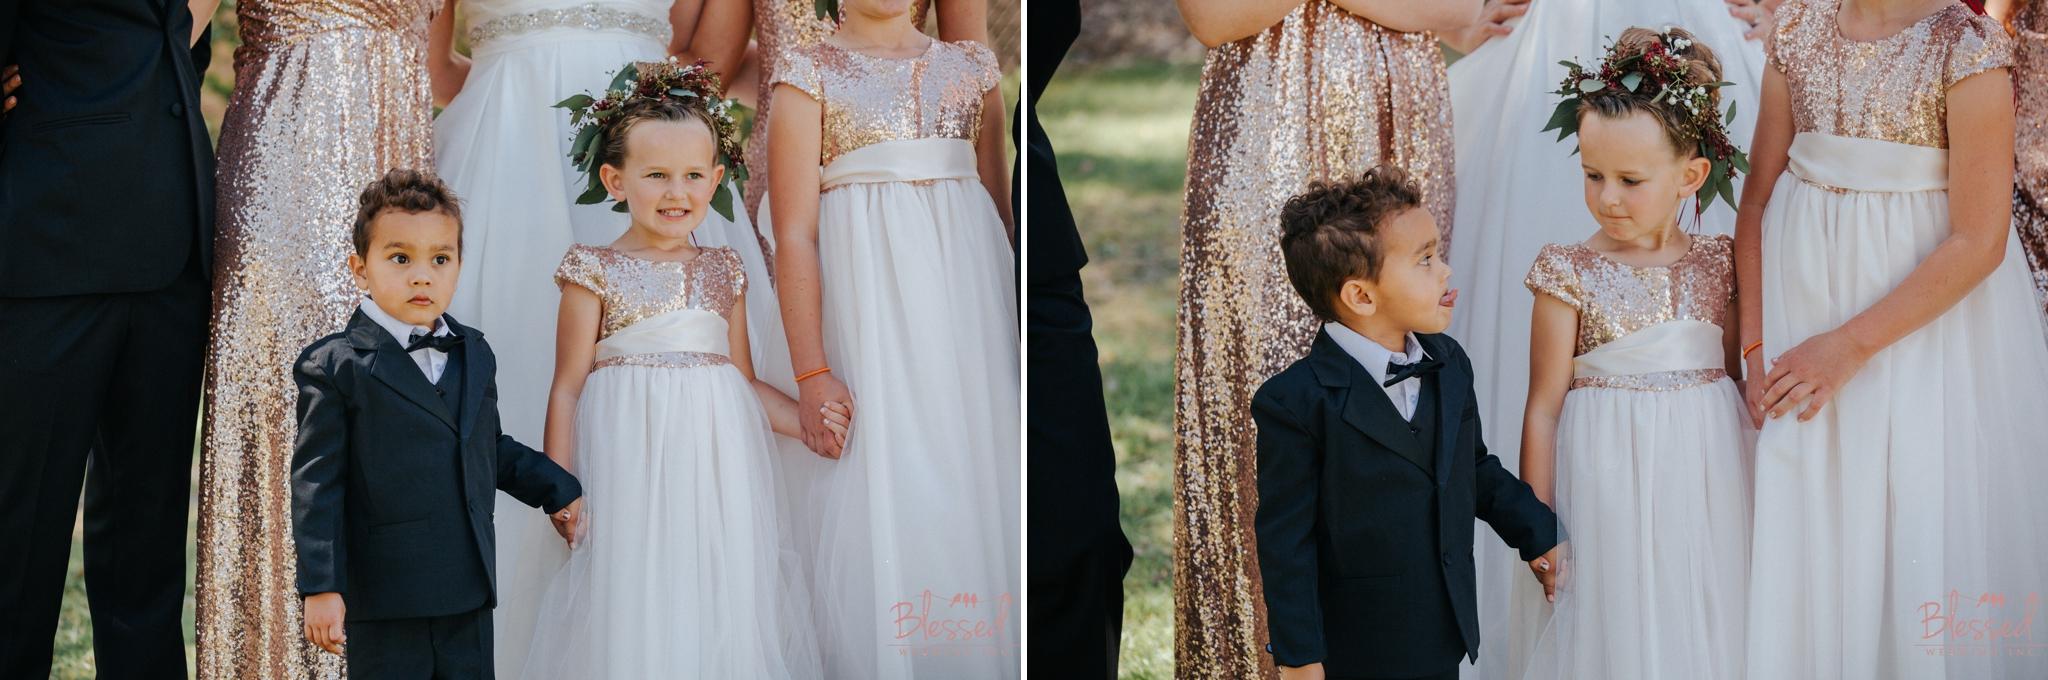 Orfila Vinery Wedding by Blessed Wedding Photography 26.jpg